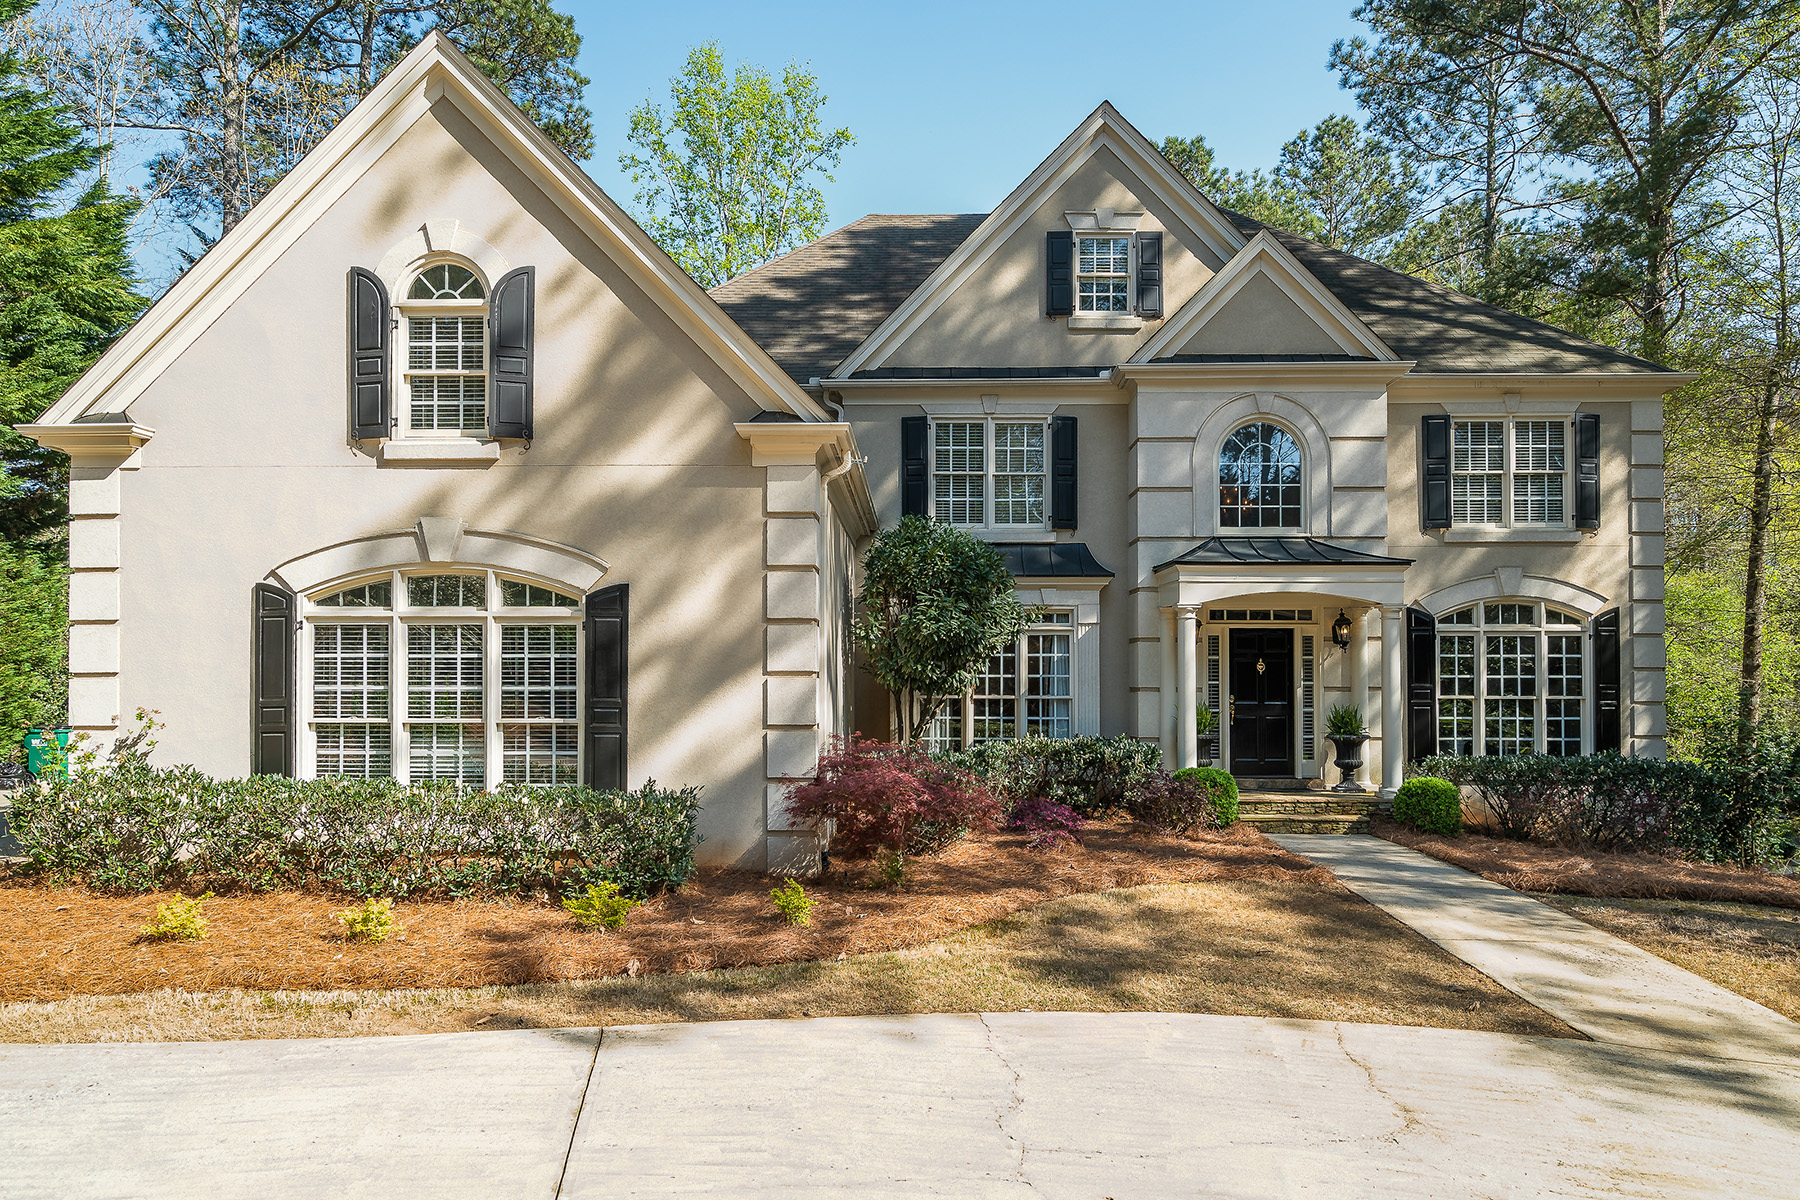 Single Family Home for Sale at HGTV Ready 500 Glen Hampton Drive Milton, Georgia 30004 United States